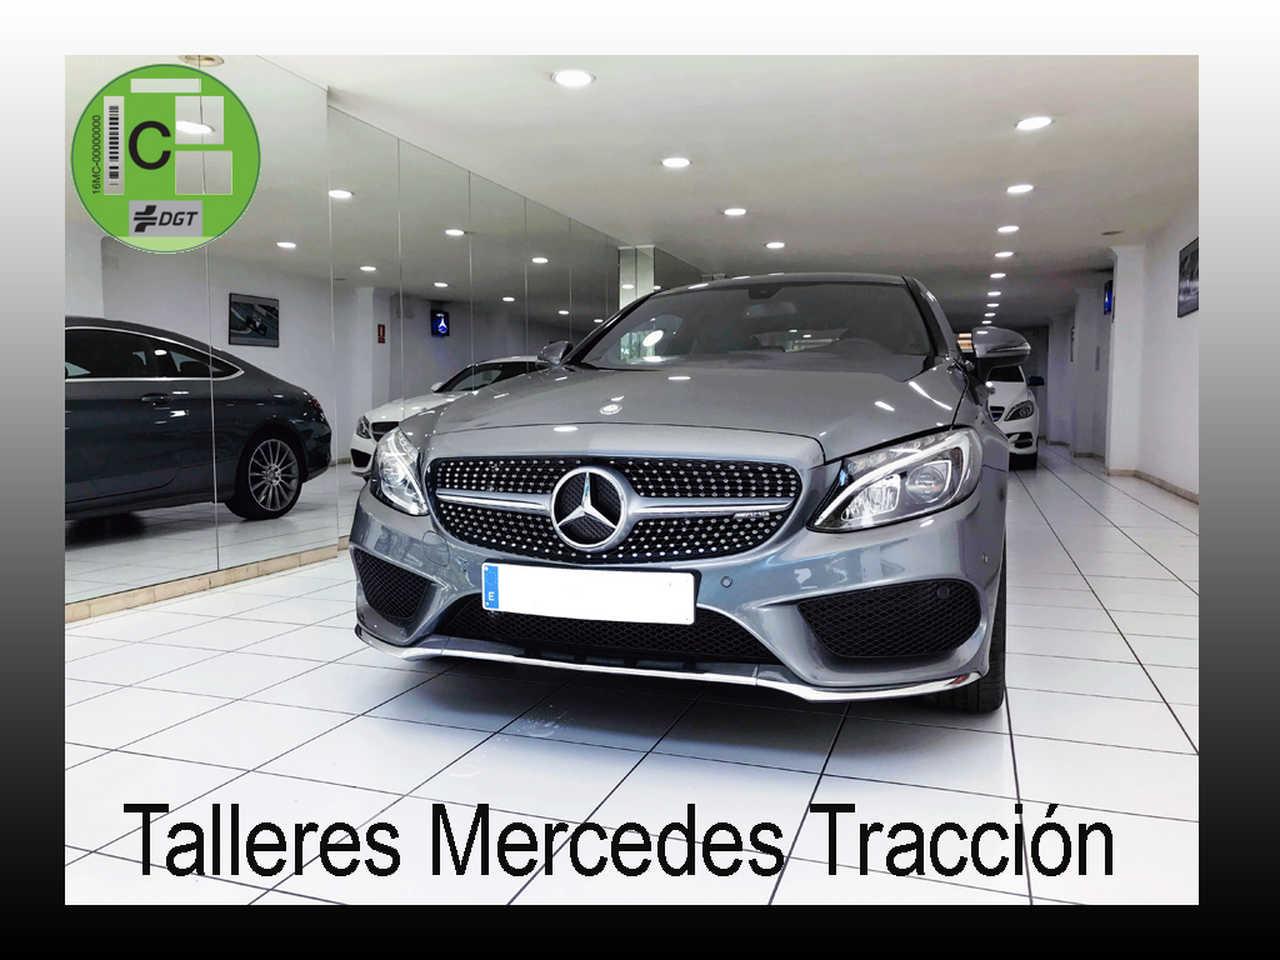 "Mercedes Clase C 220 d Coupe 4 Matic/Paquete AMG/Llanta 19""/Camara   - Foto 1"